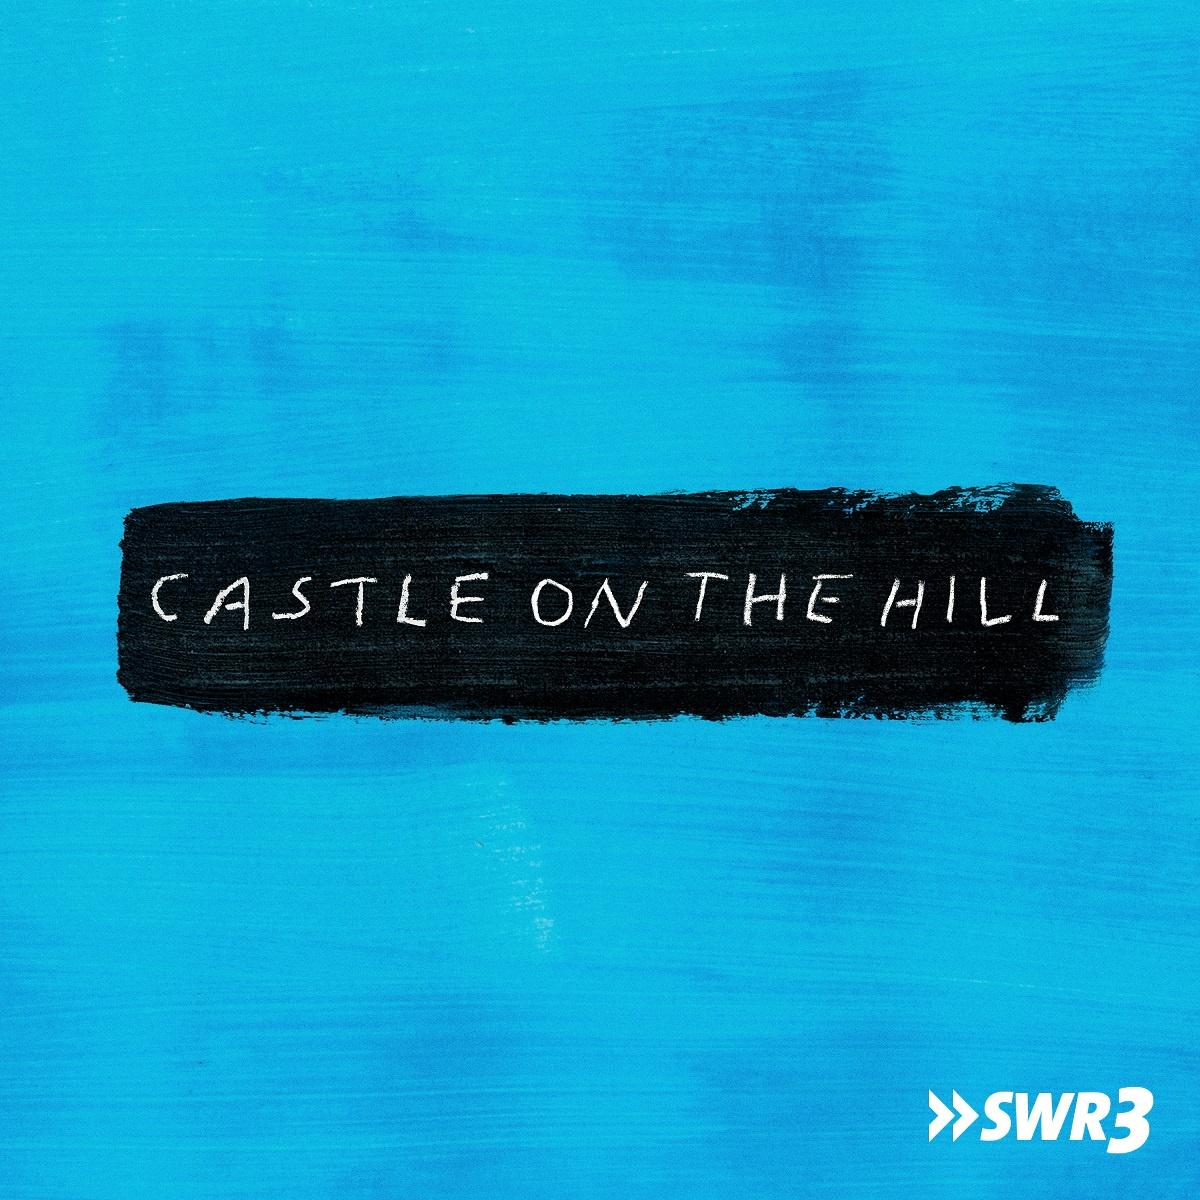 Castle on the hill (Foto: Ed Sheeran)